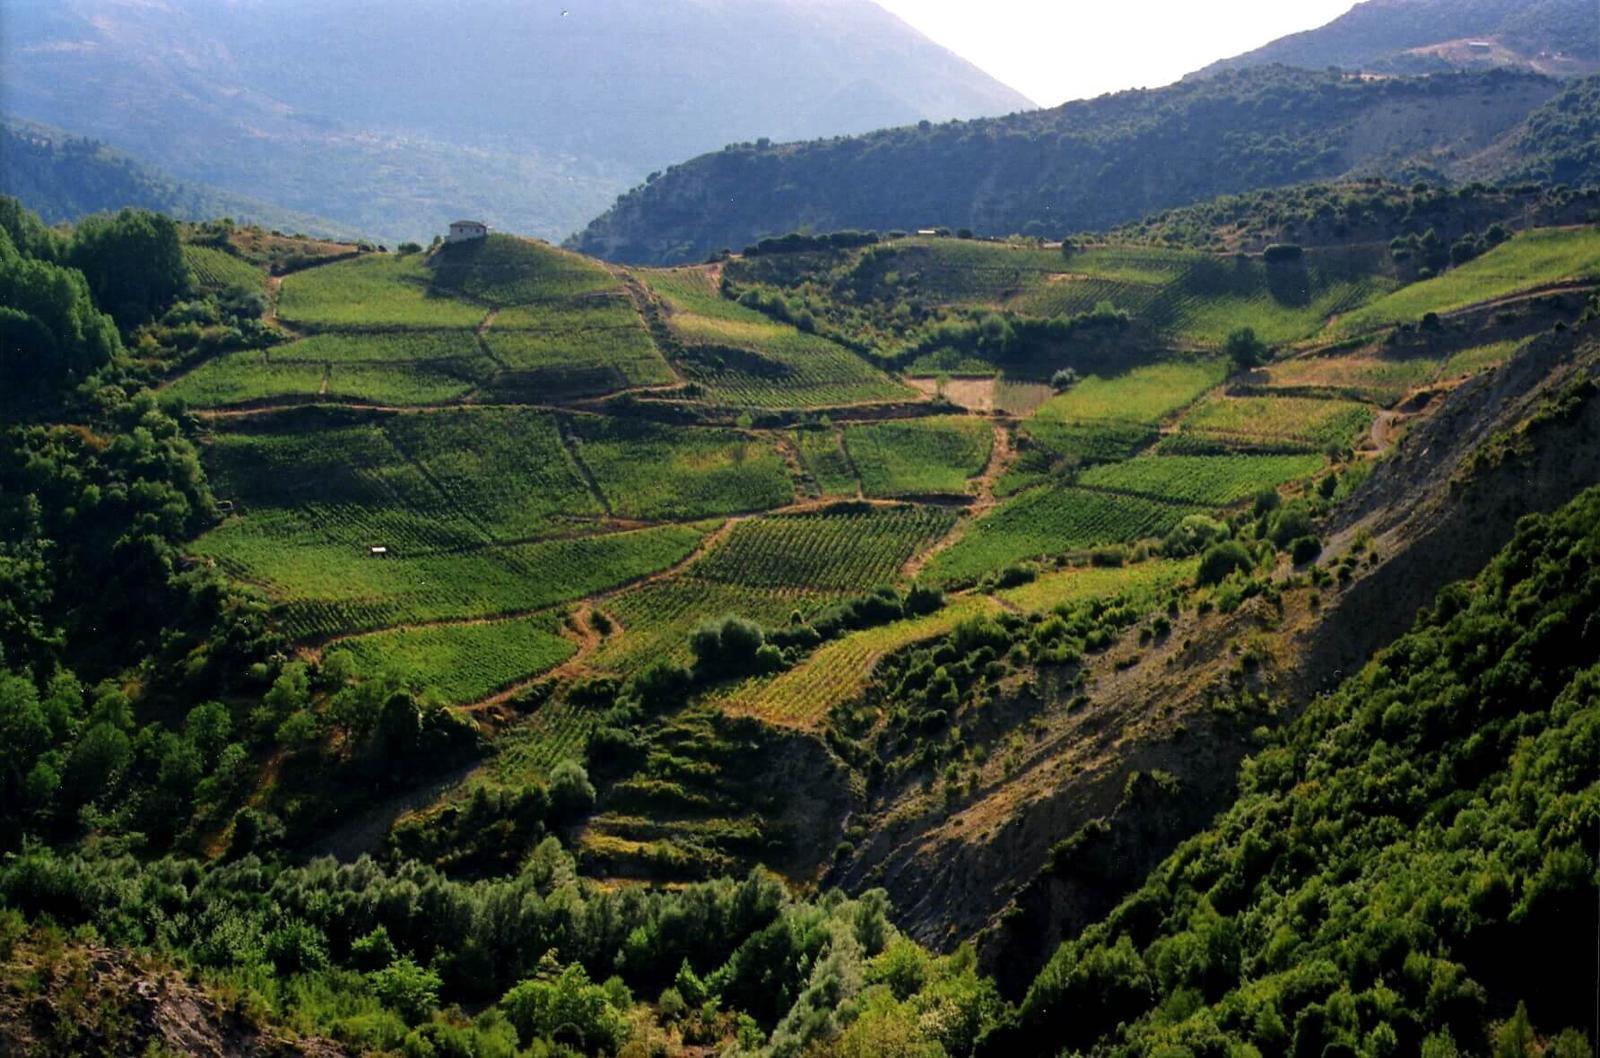 vineyard1 (1) οινοτουρισμος στην ελλαδα μετσοβο